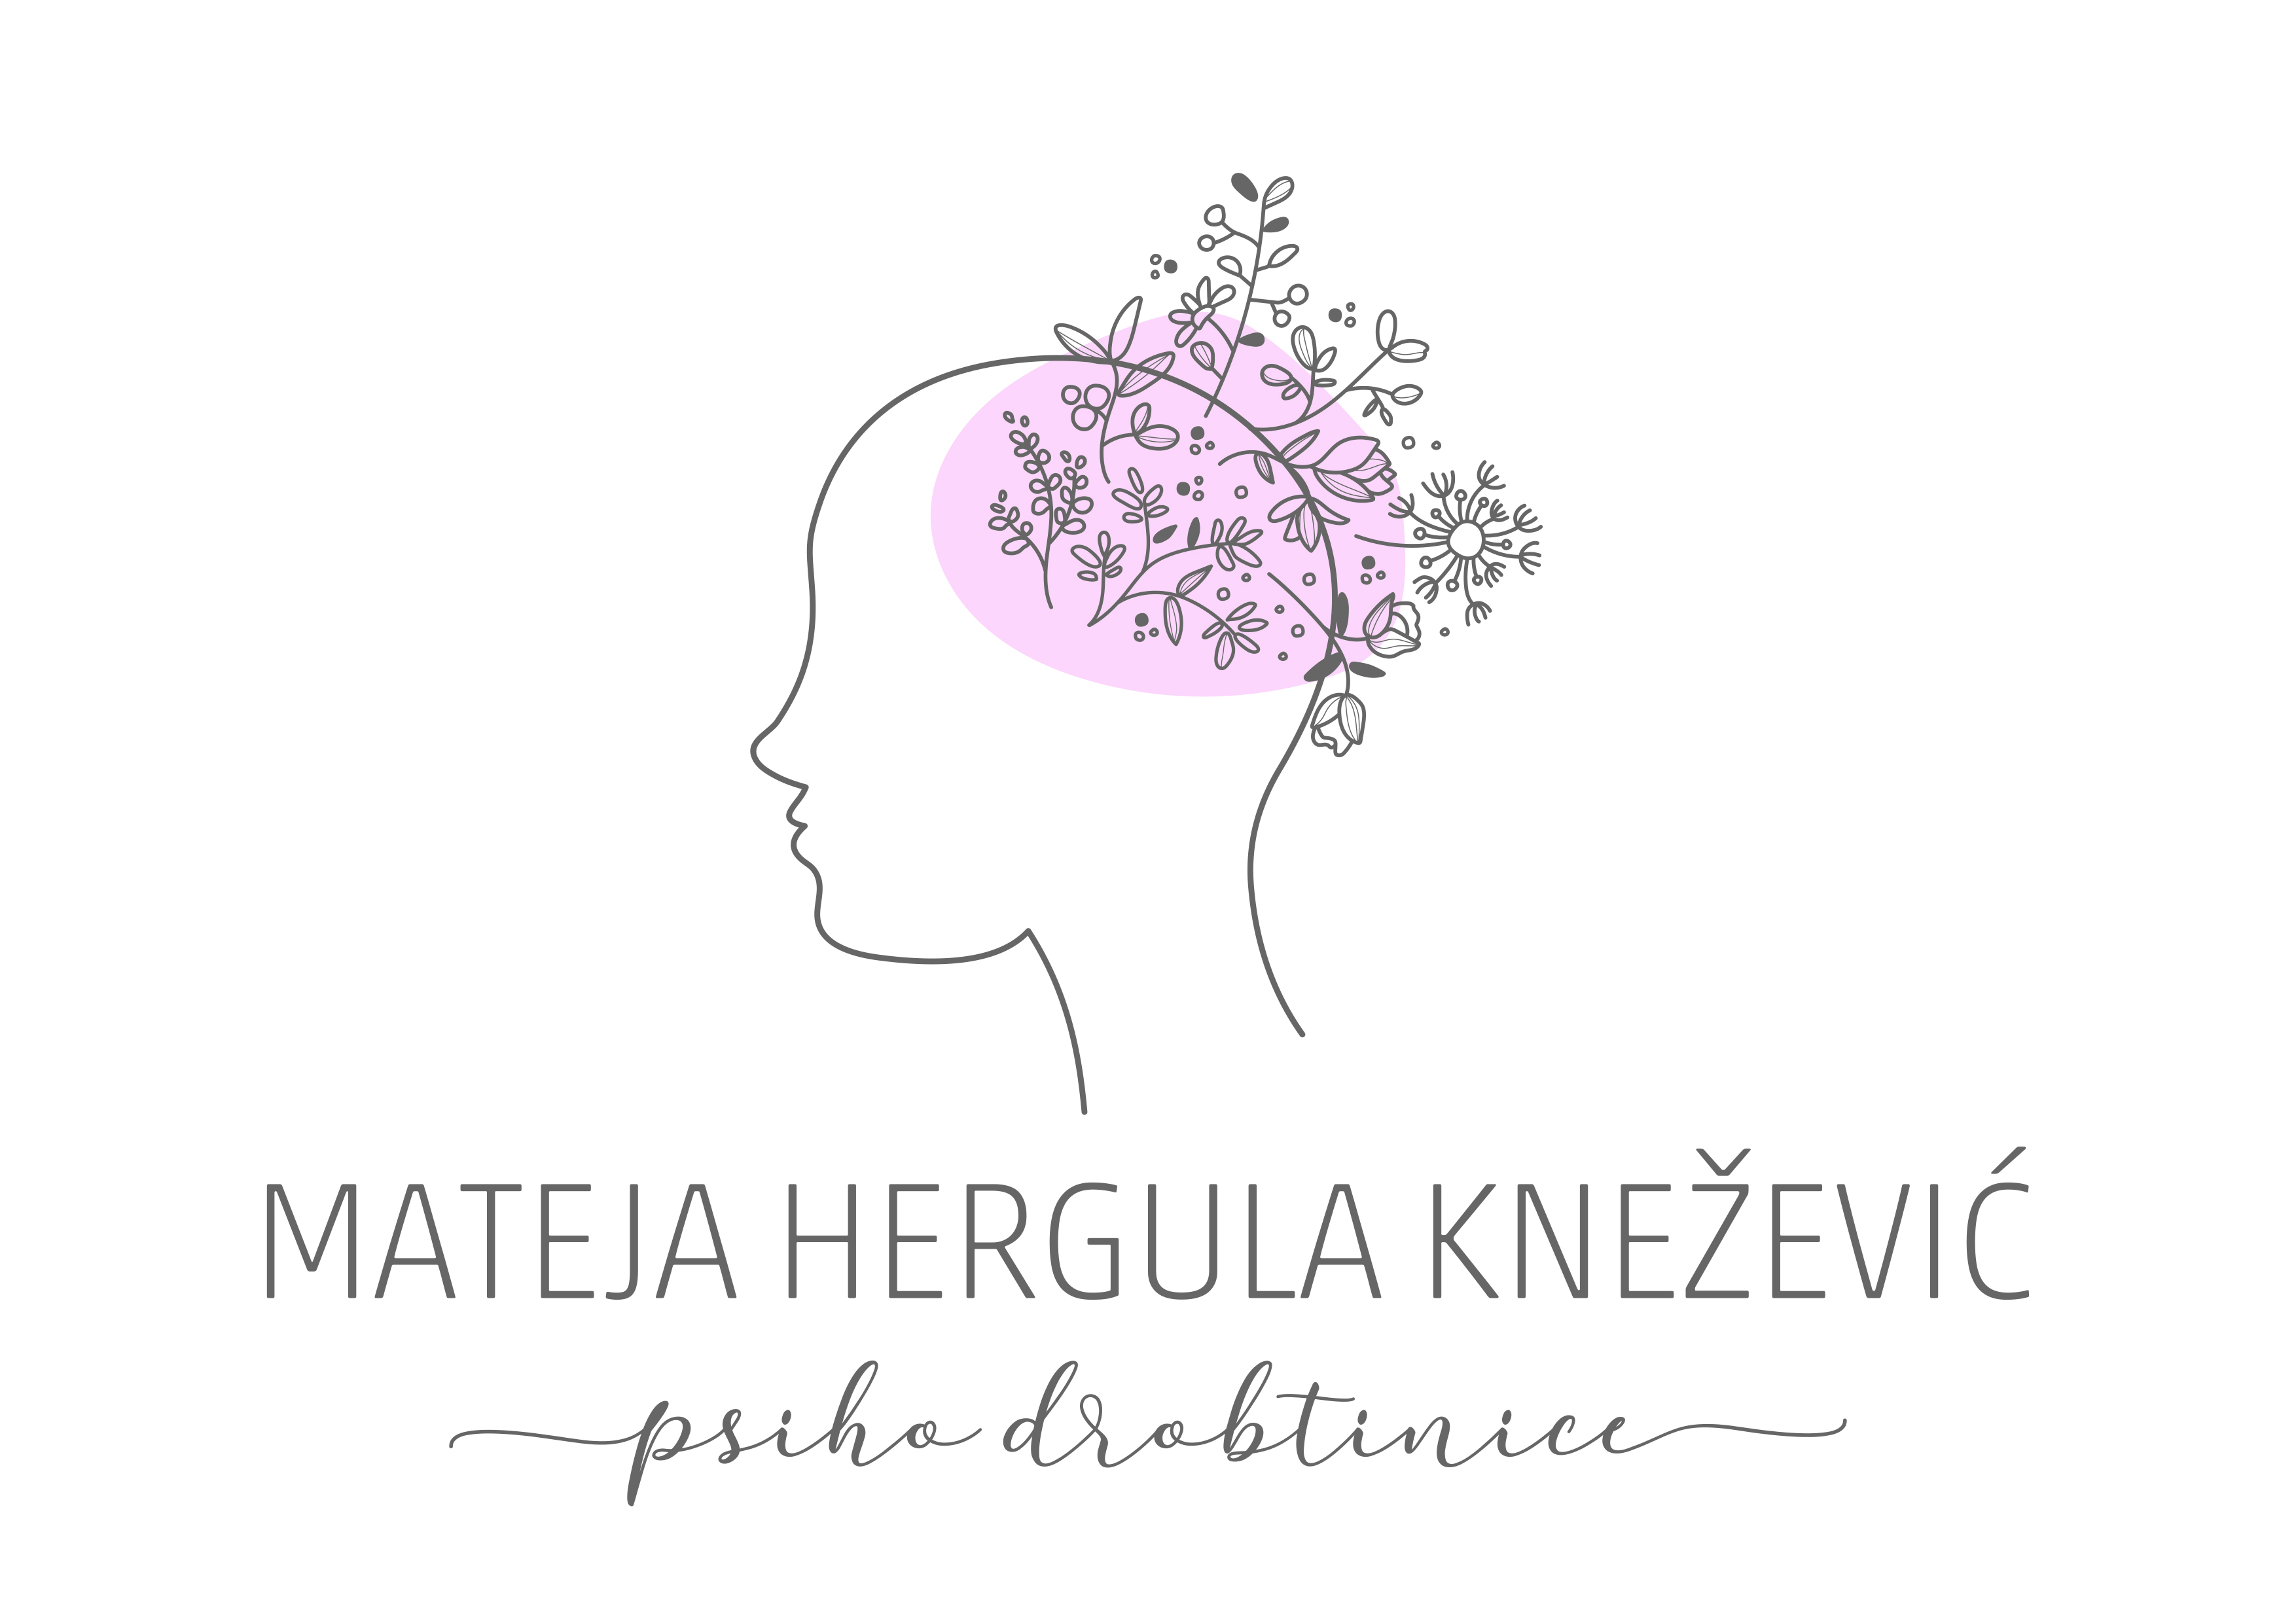 Psihodrobtinice_primarni_logotip.cdr